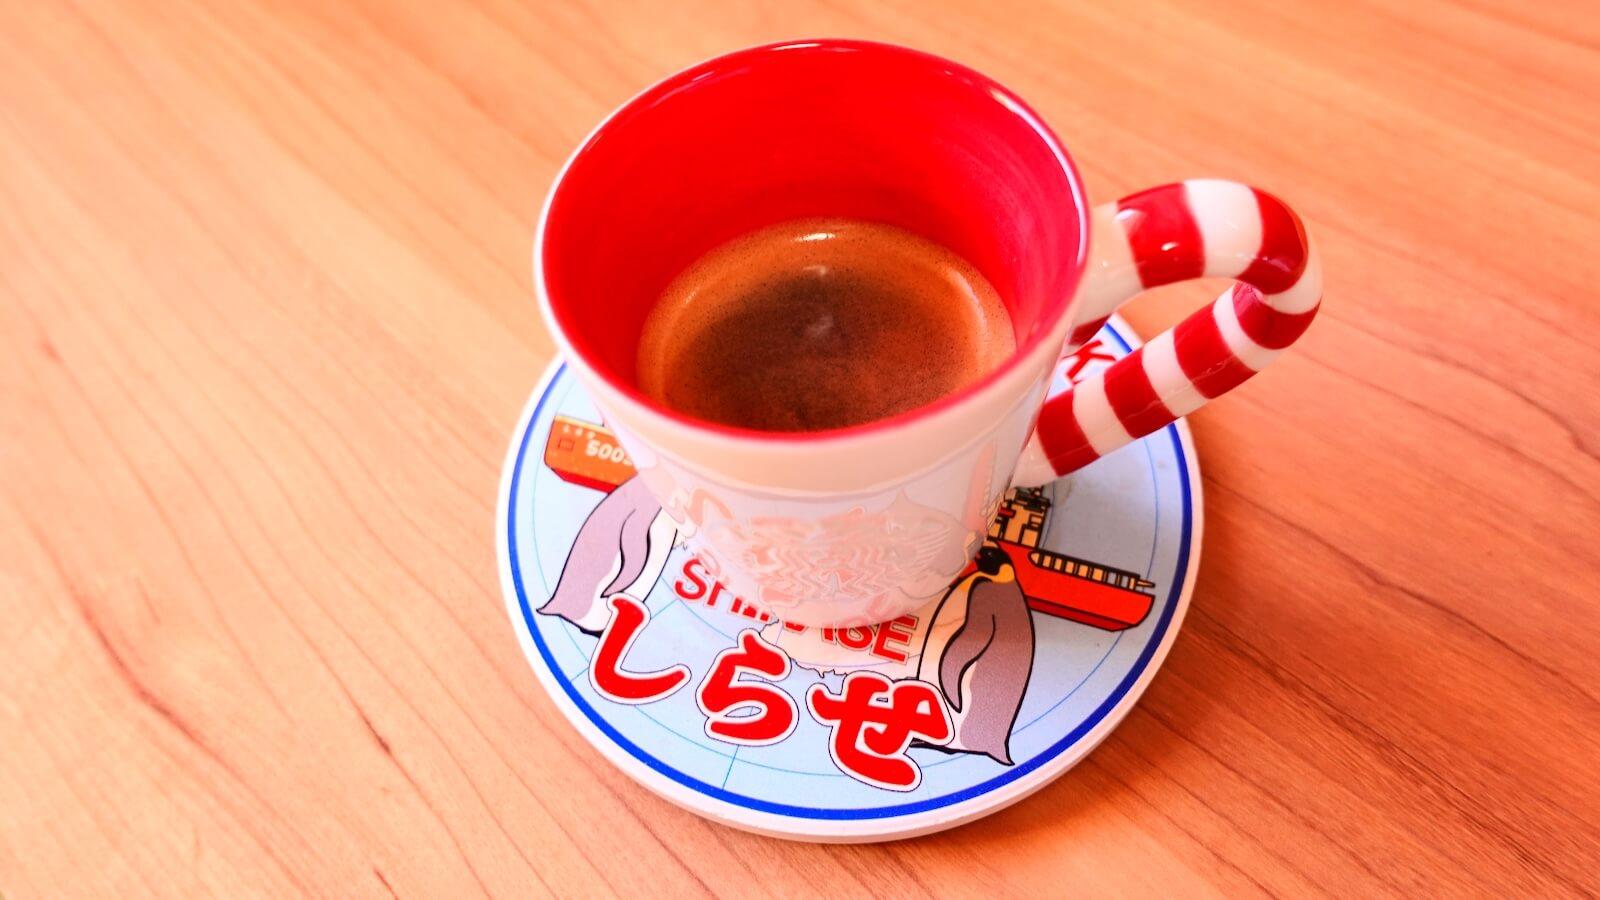 30ccm espresso poured into a demitasse cup